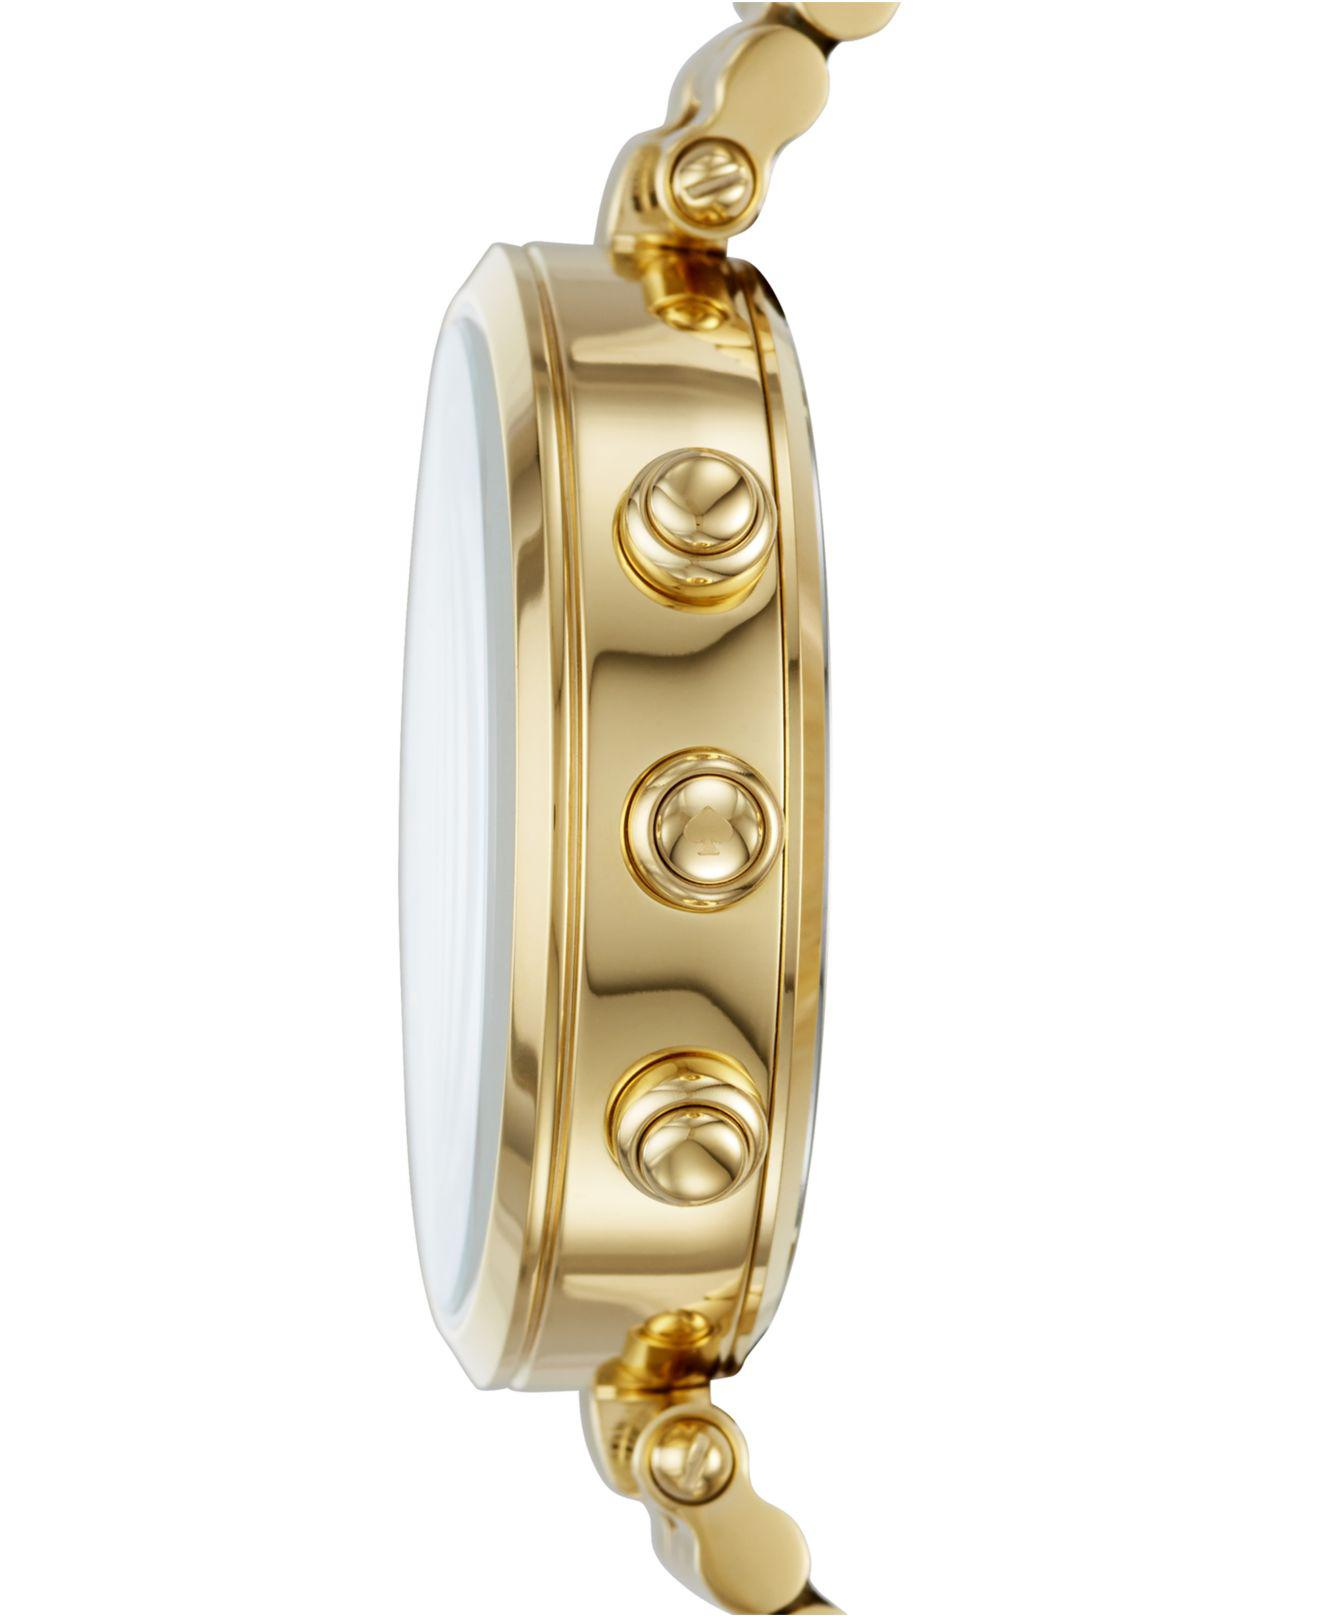 af0ce3fb3a9 Lyst - Kate Spade Women s Holland Slim Gold-tone Stainless Steel Bracelet  Hybrid Smart Watch 38mm in Metallic